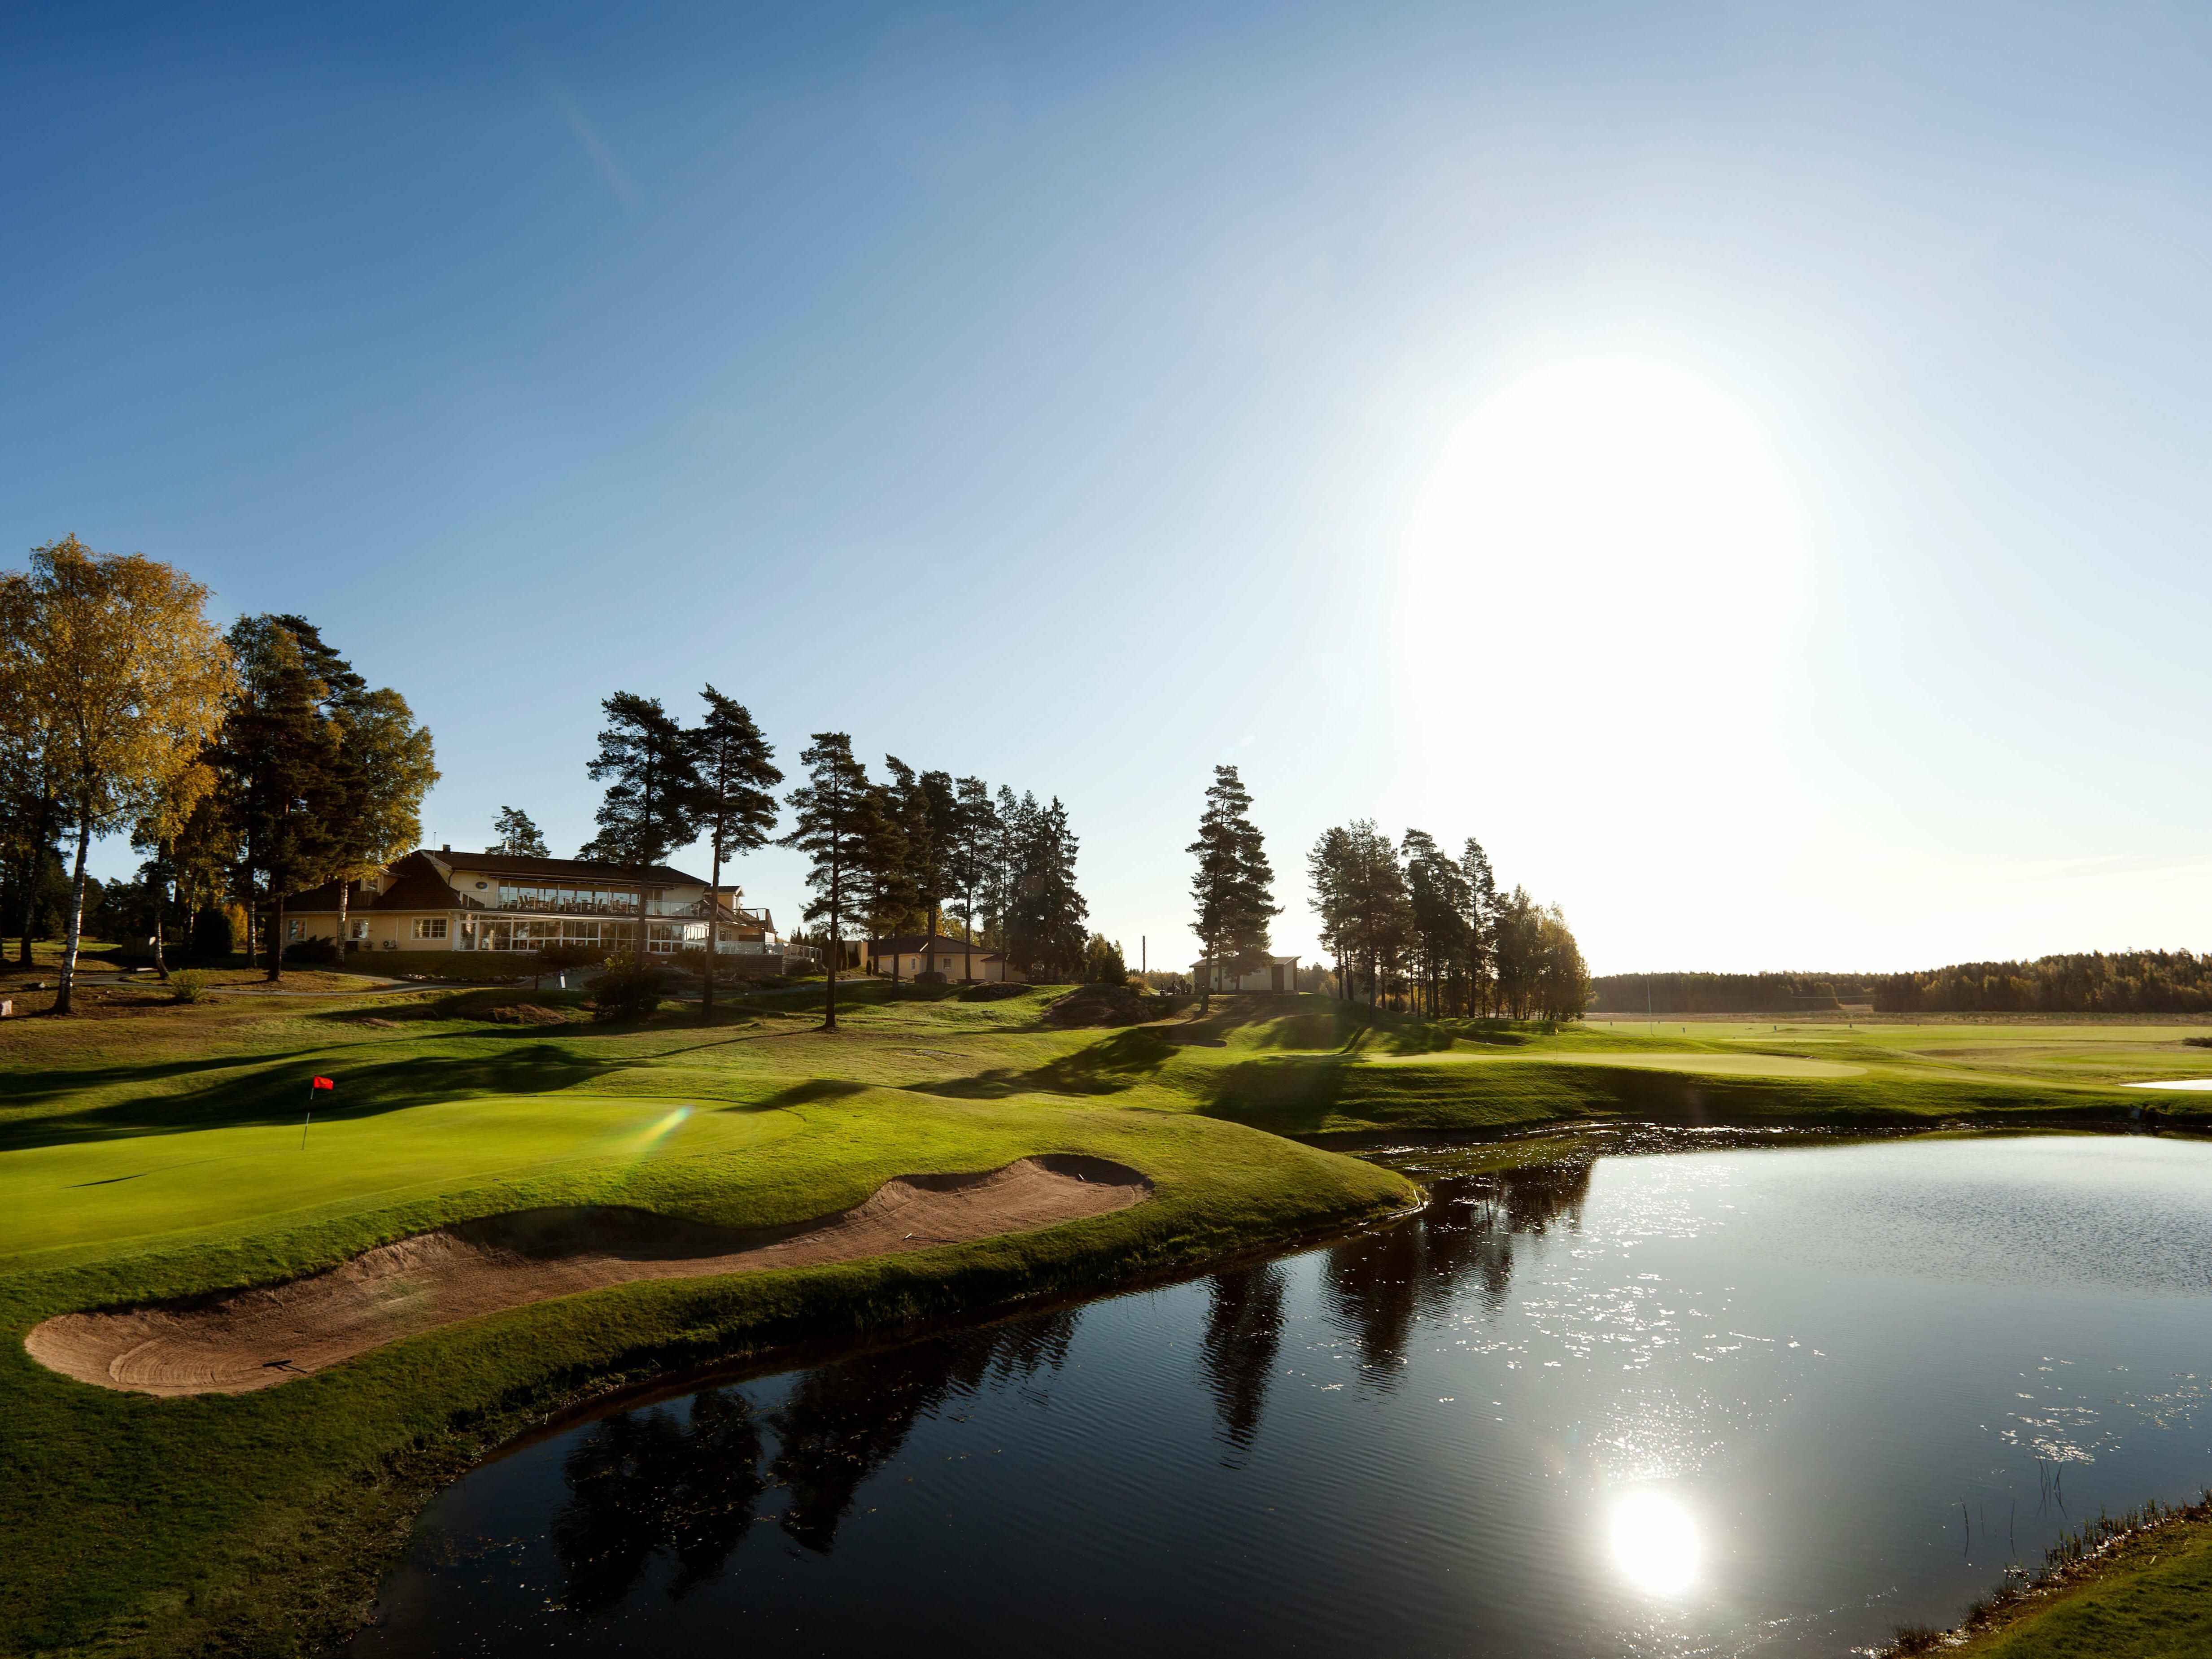 Golf, Spa & Dine at Welcome Hotel in Järfälla near Stockholm